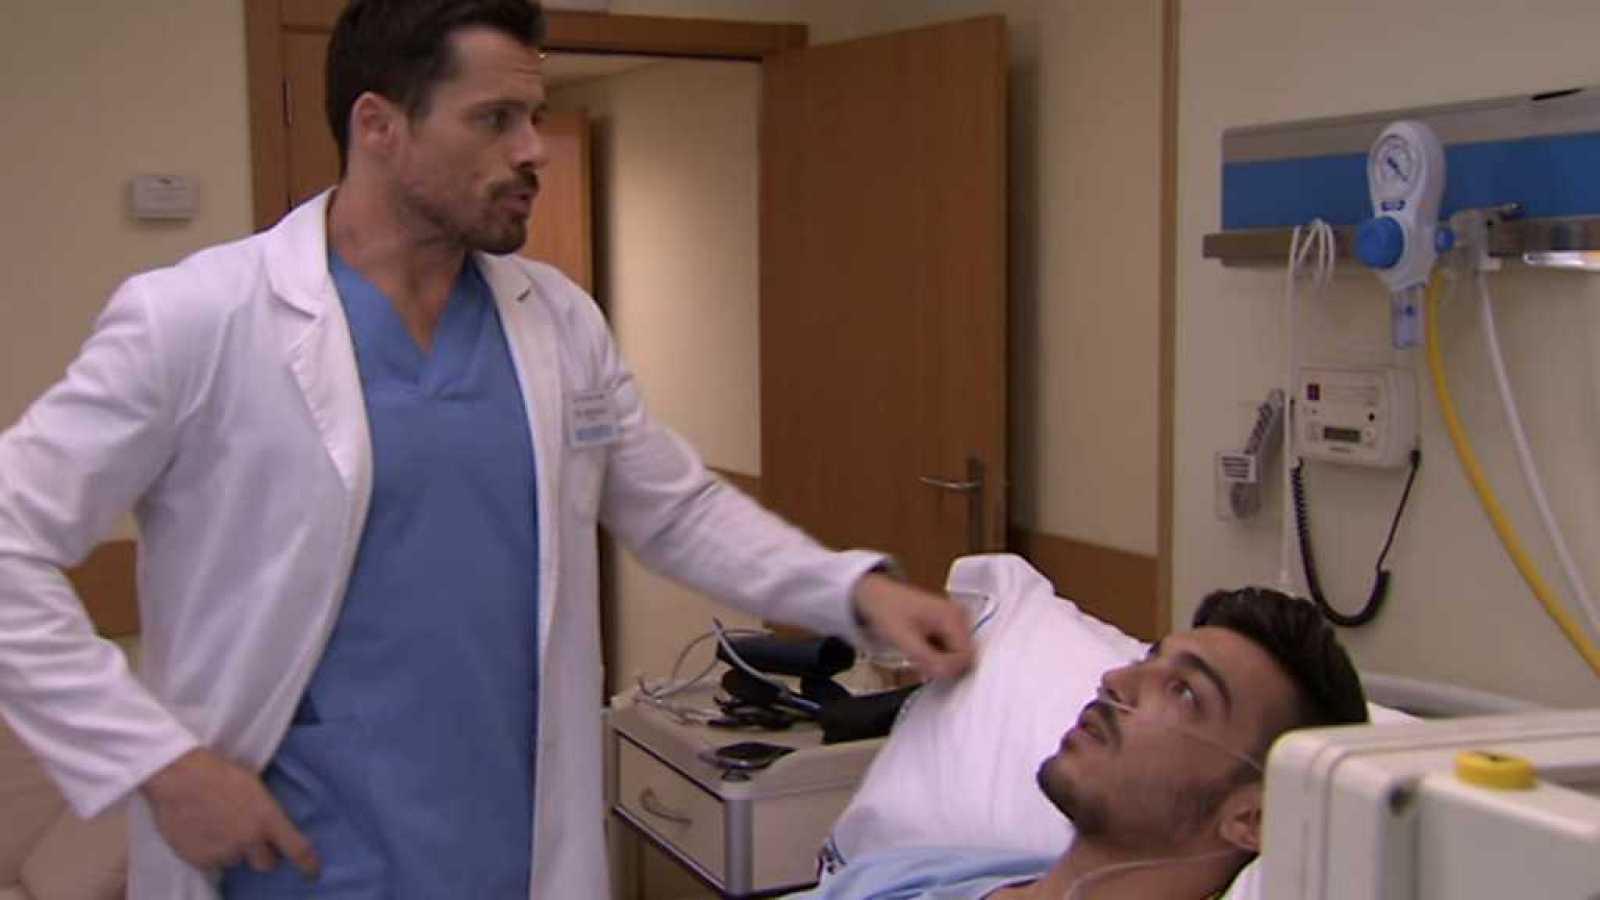 visita a la próstata duele allí